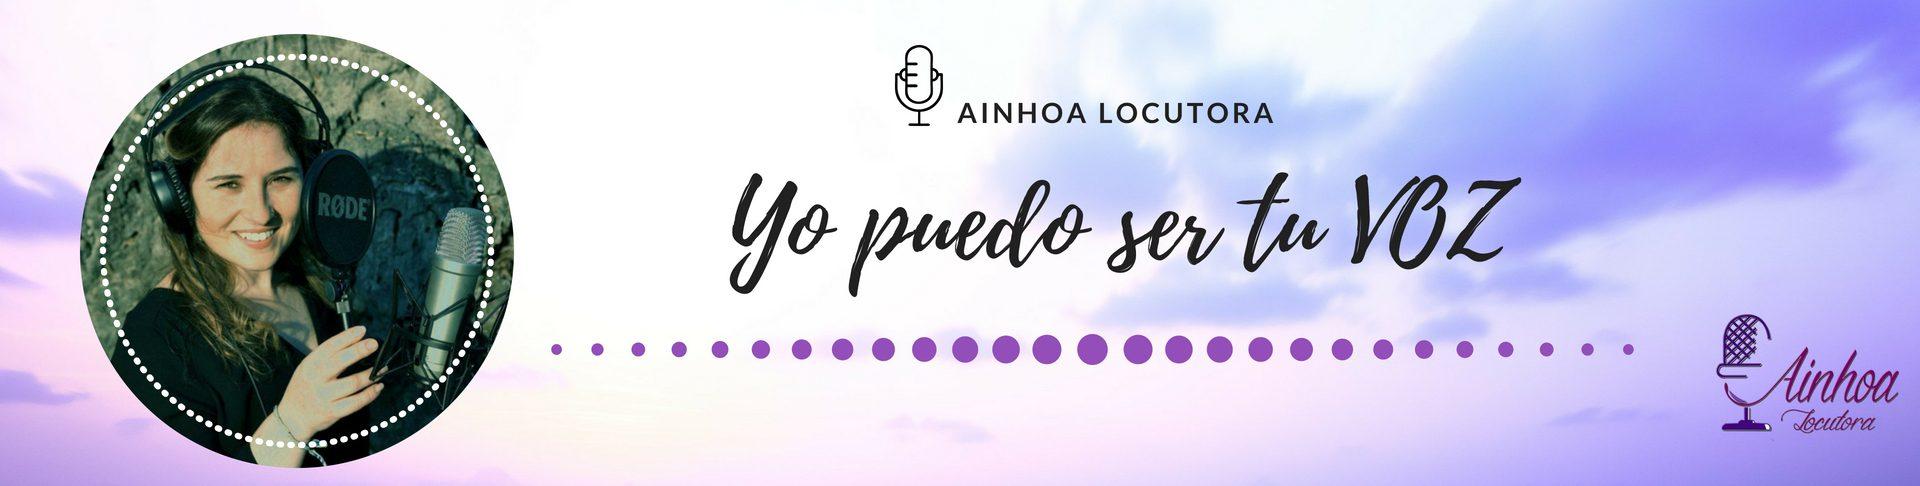 Ainhoa Miguel LOCUTORA